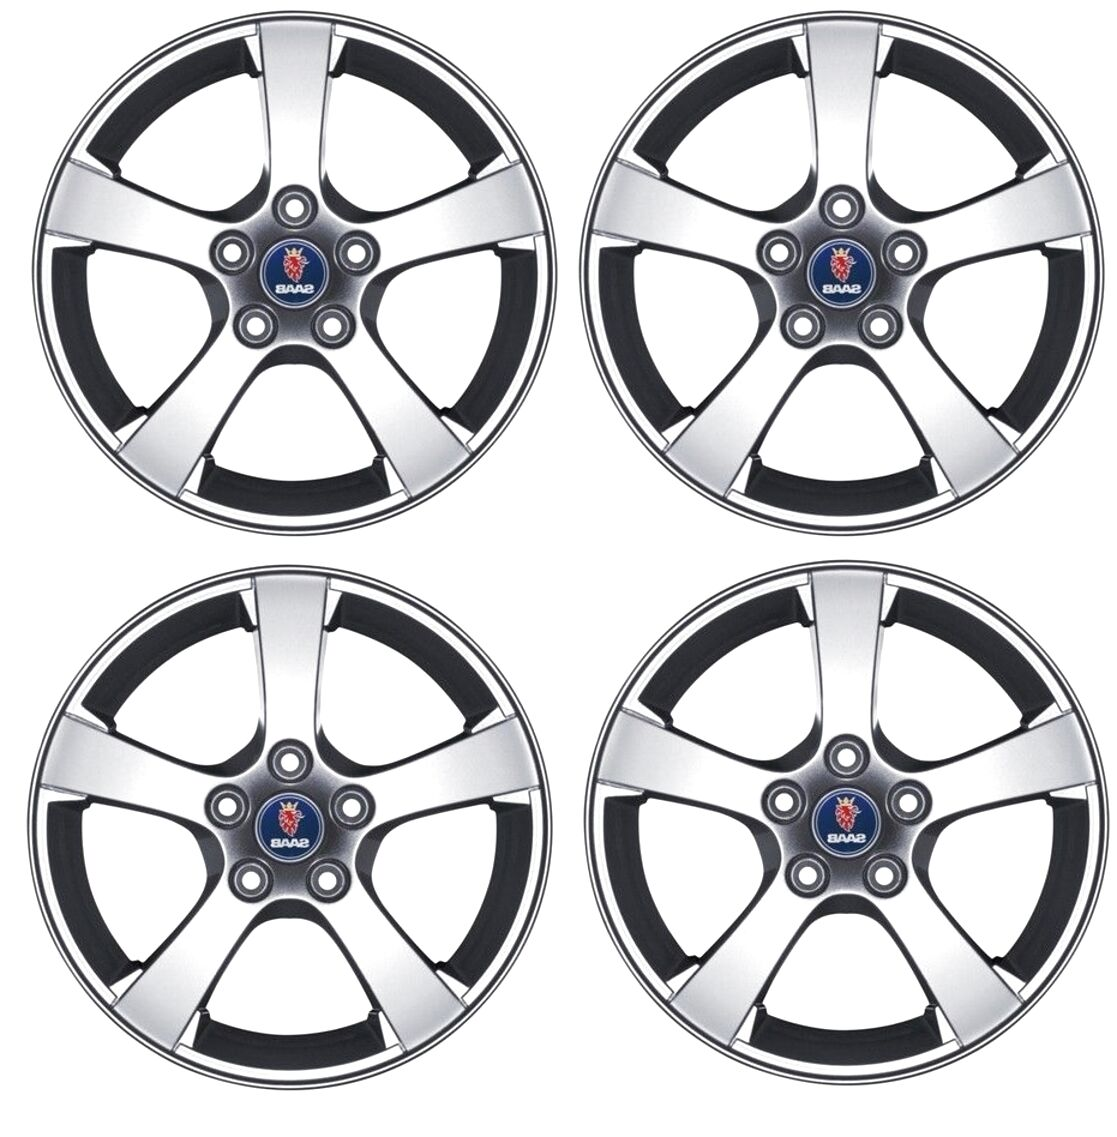 saab wheels for sale